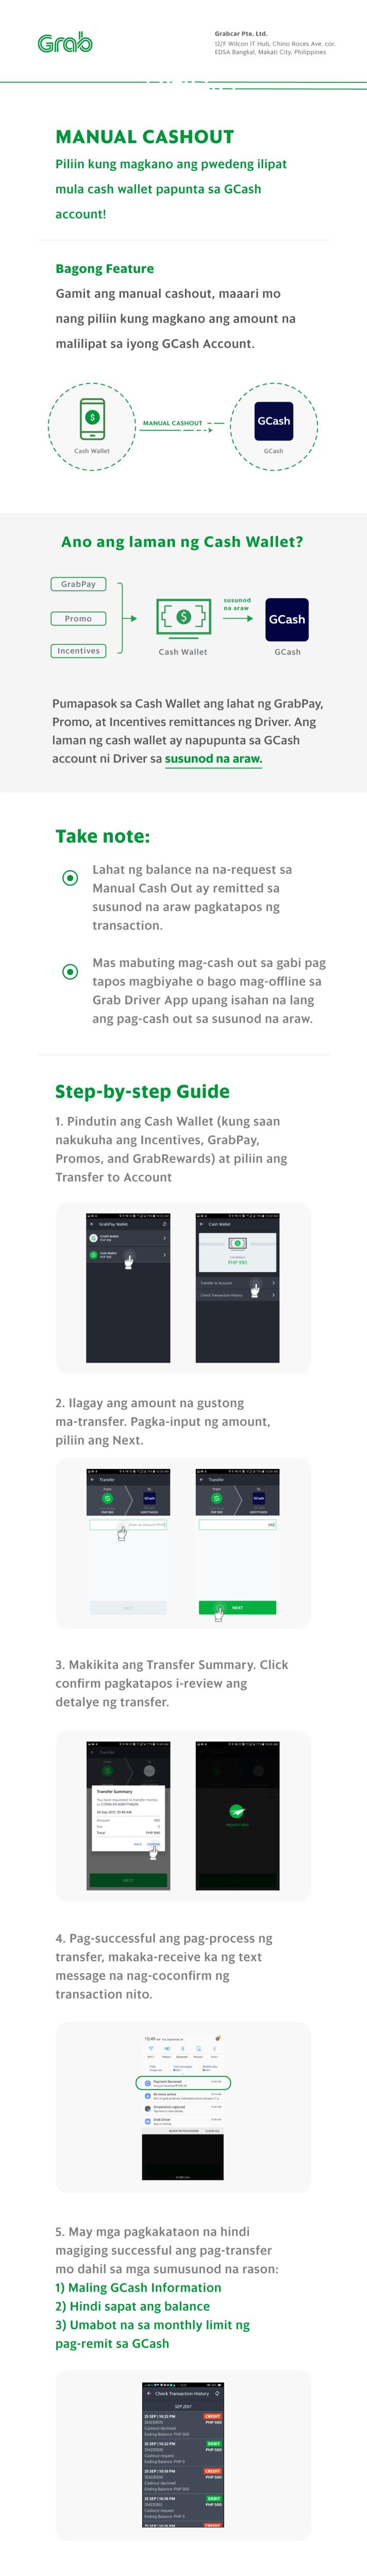 Manual-Cashout